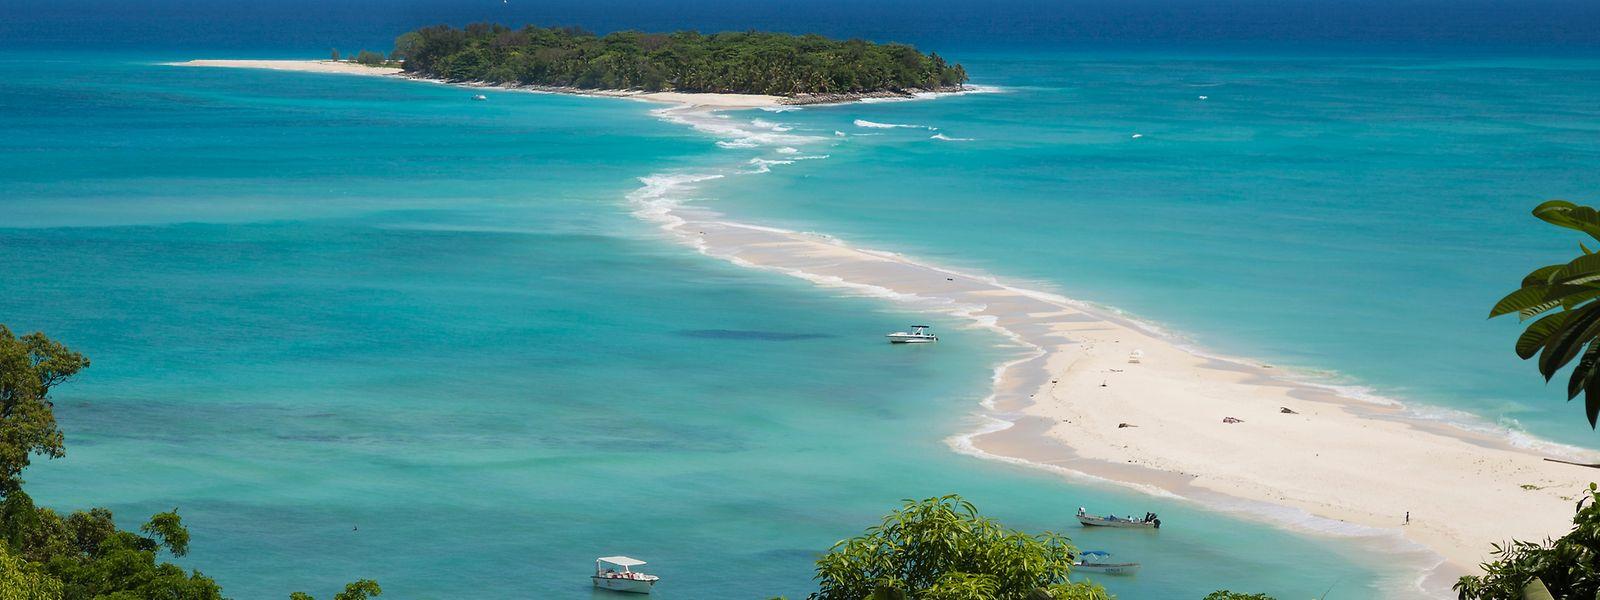 Türkisblaues Wasser umgibt den Tropeninselstrand Nosy Be vor der Küste Madagaskars.